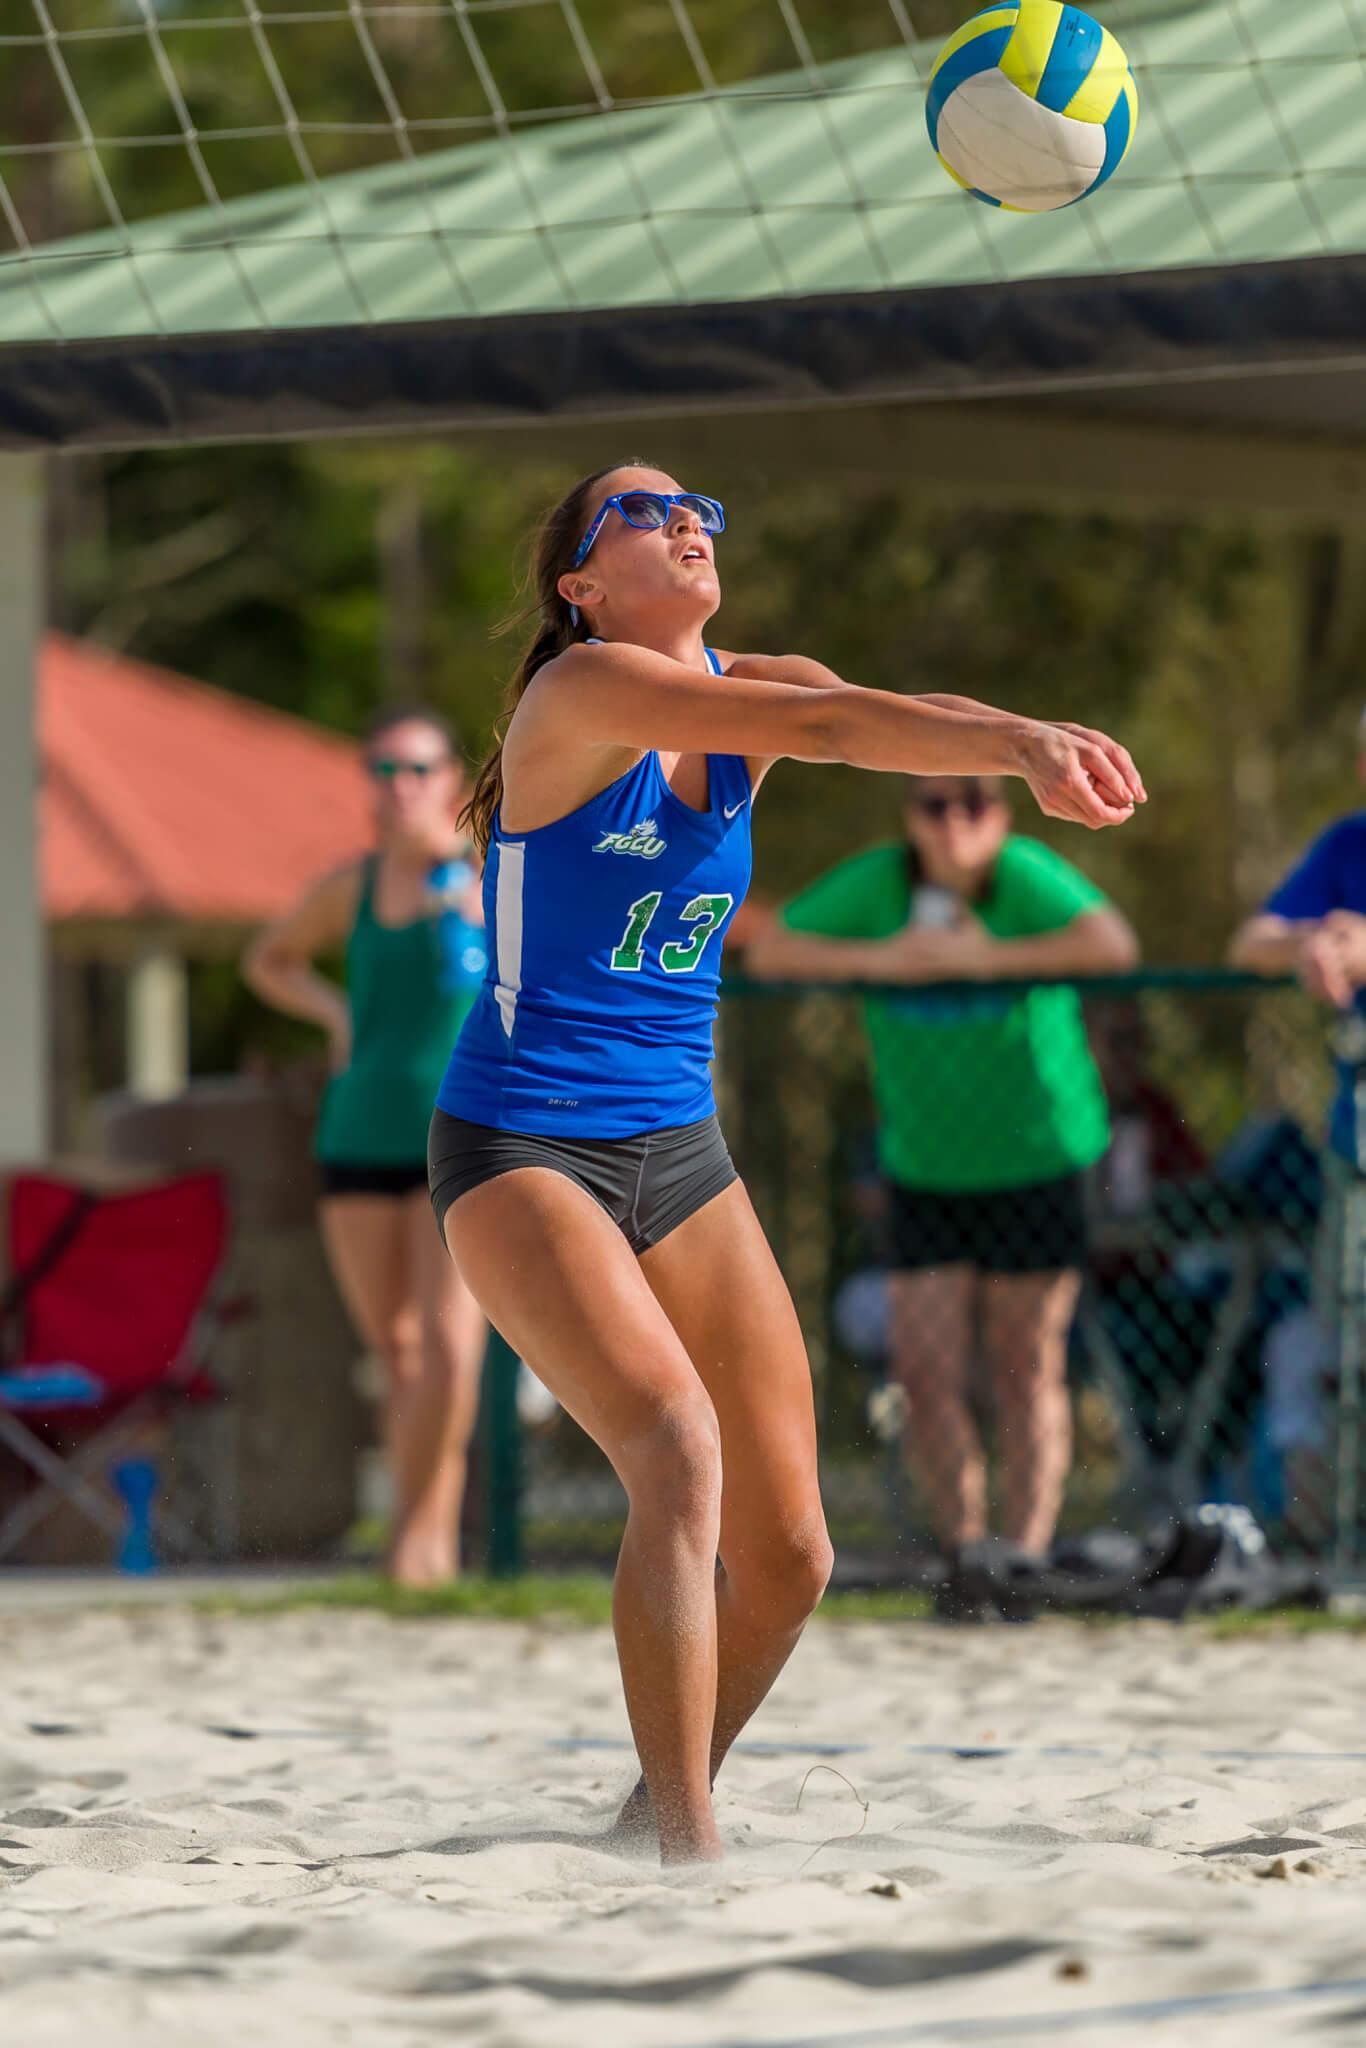 Elisa Anne Aldrich named to the A-Sun's All-Freshman Team